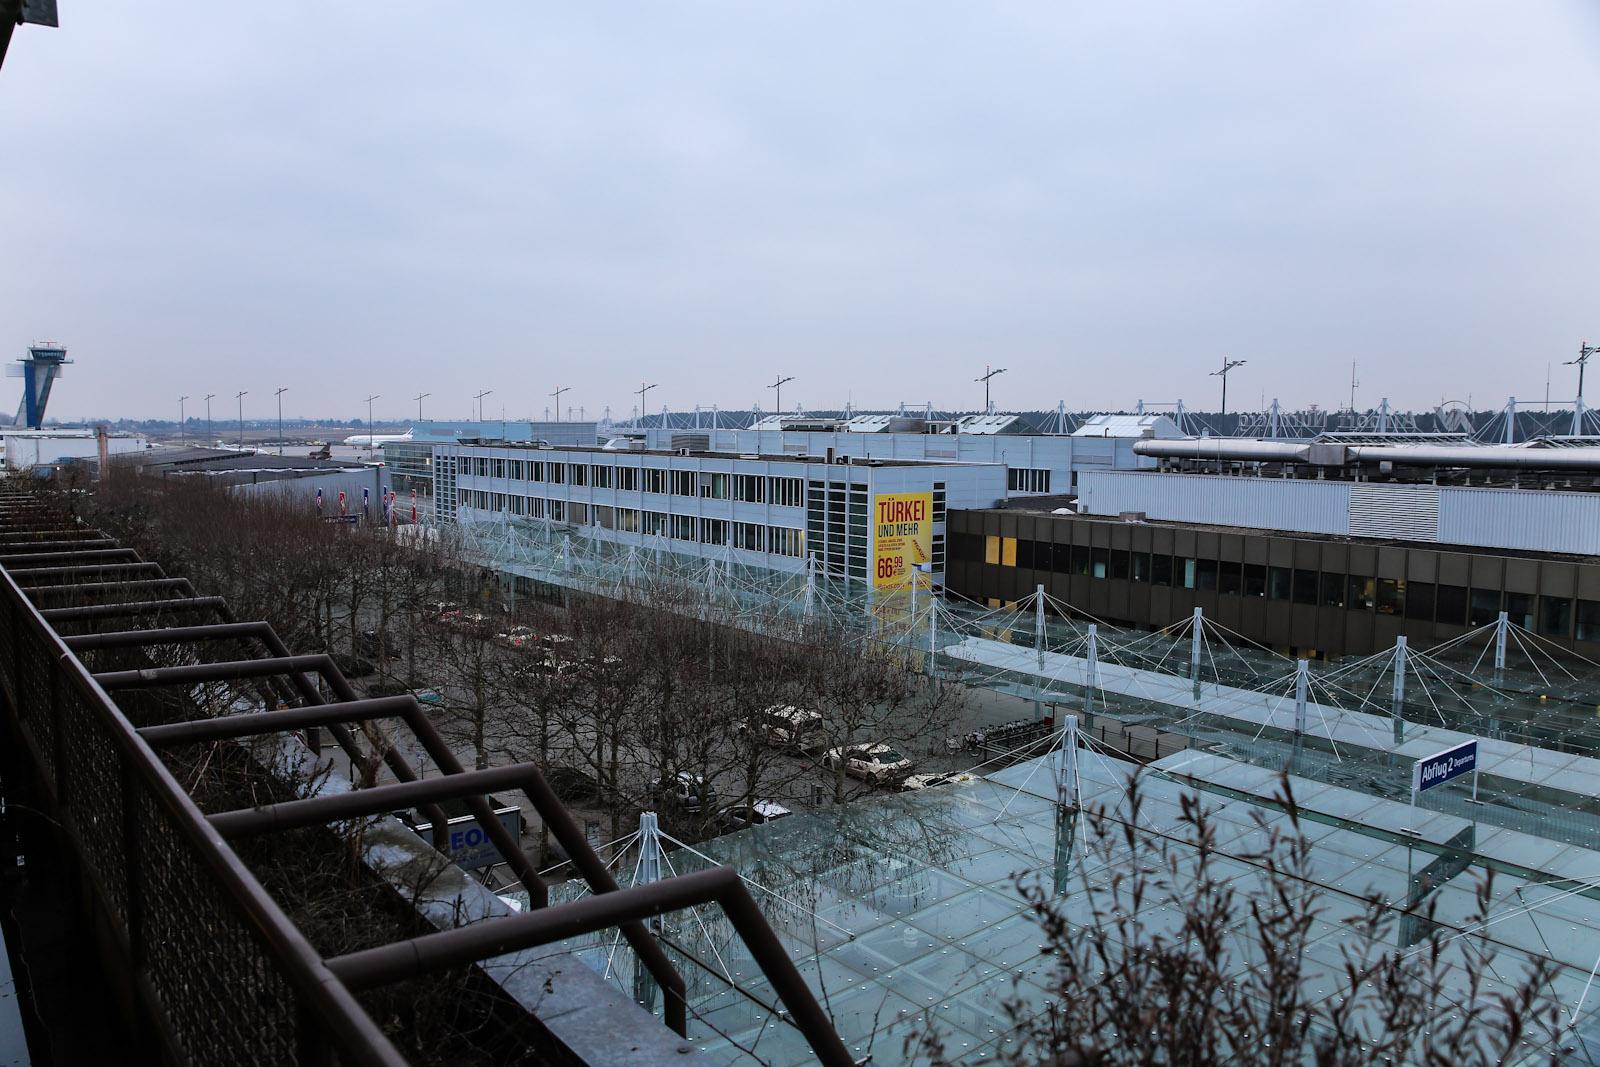 Левое крыло аэровокзала аэропорта Нюрнберг